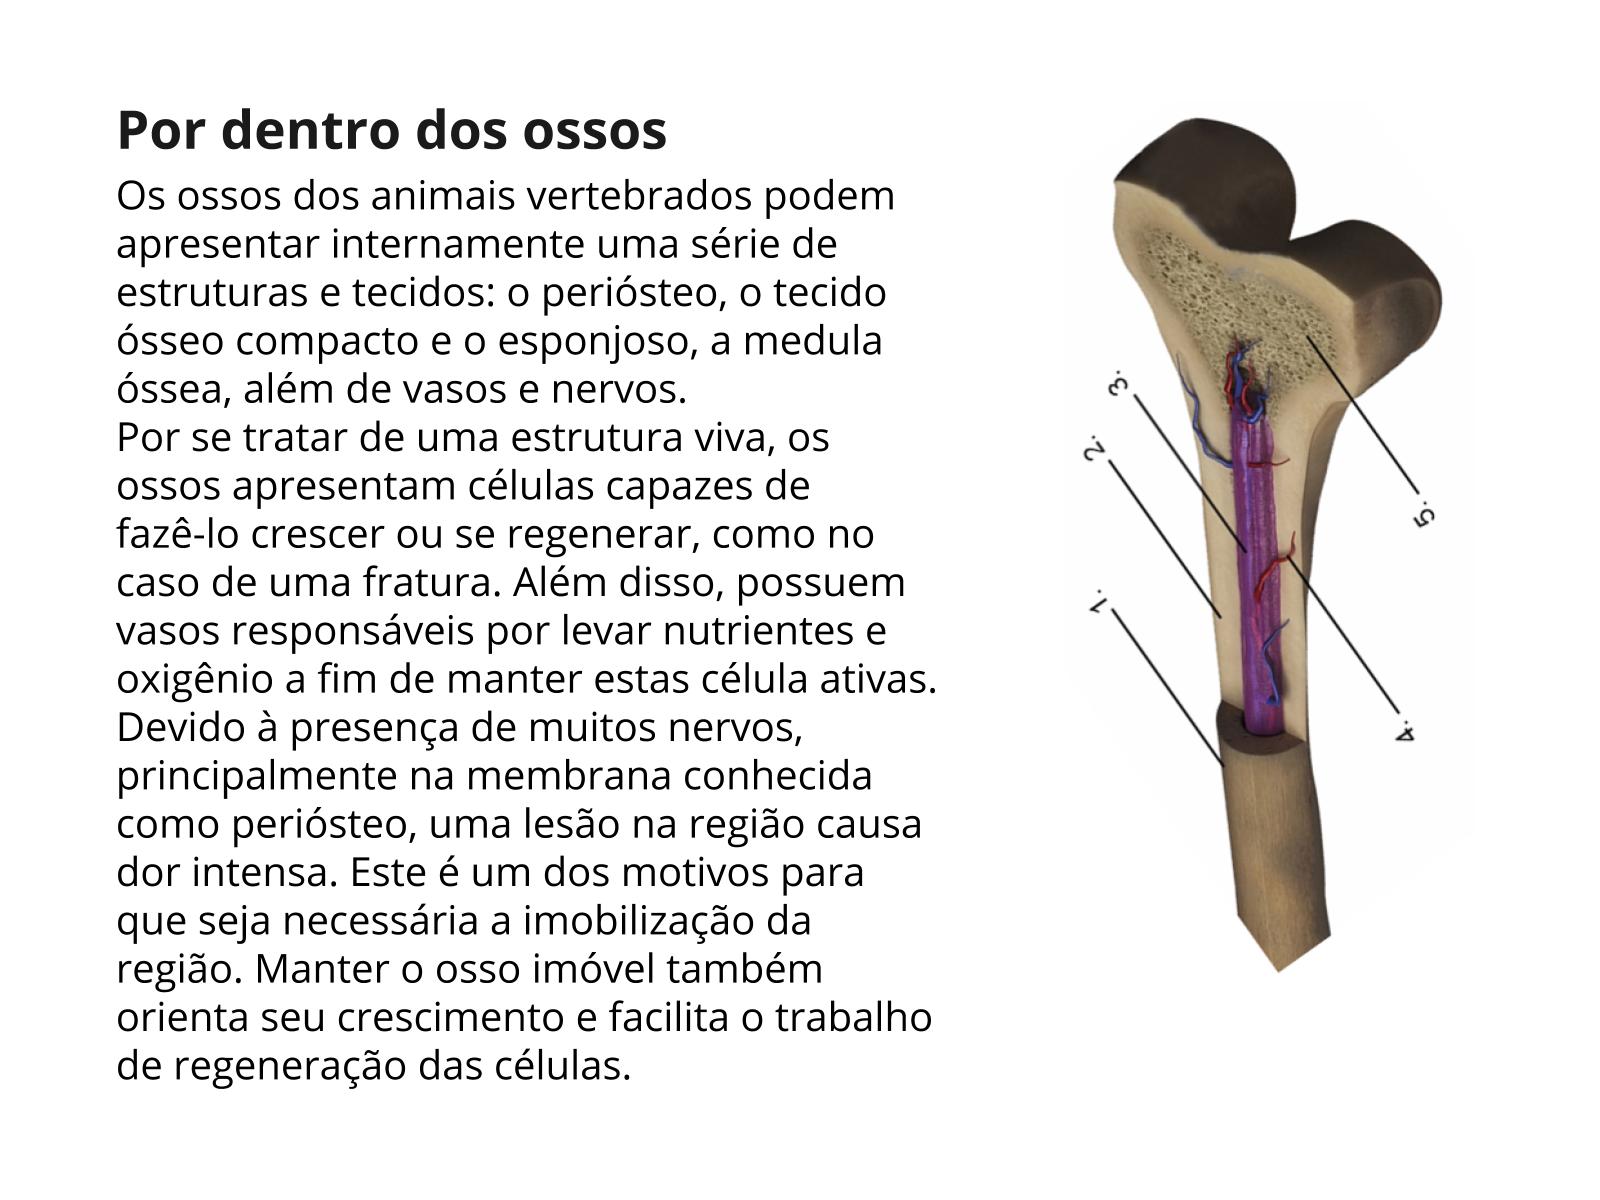 Por dentro do sistema ósseo